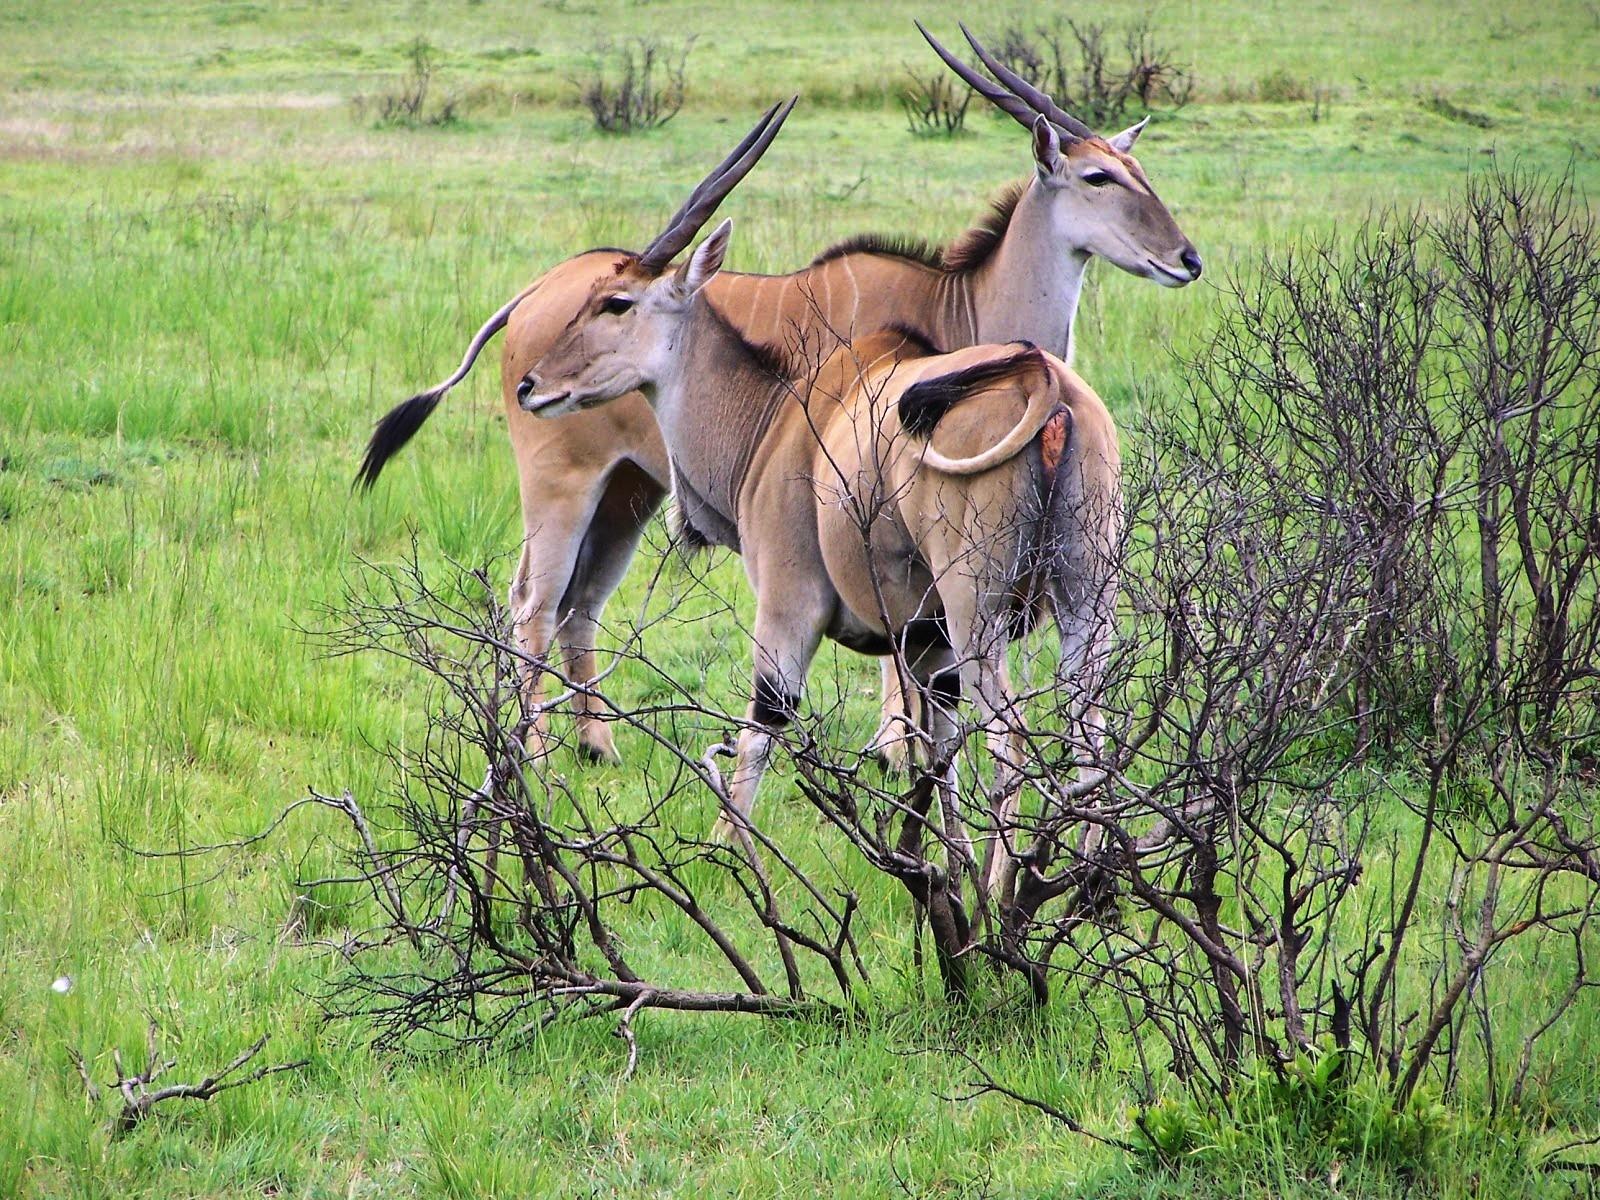 Selous-Game-Reserve-Nature-HD